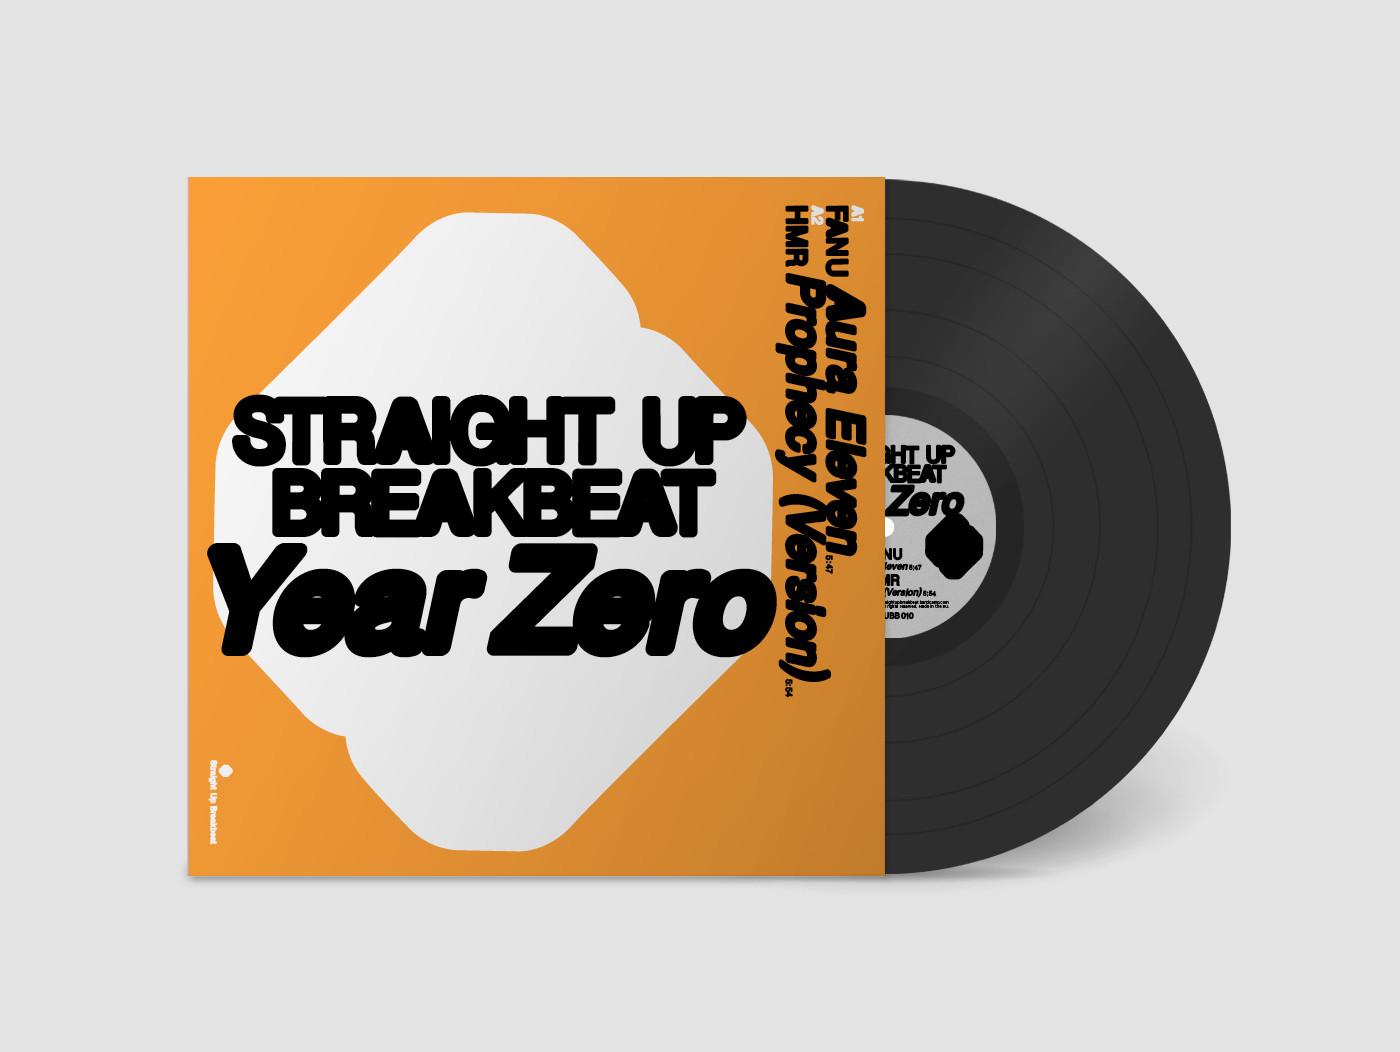 YEAR ZERO EP Fanu / Hmr / DDOG / Infader